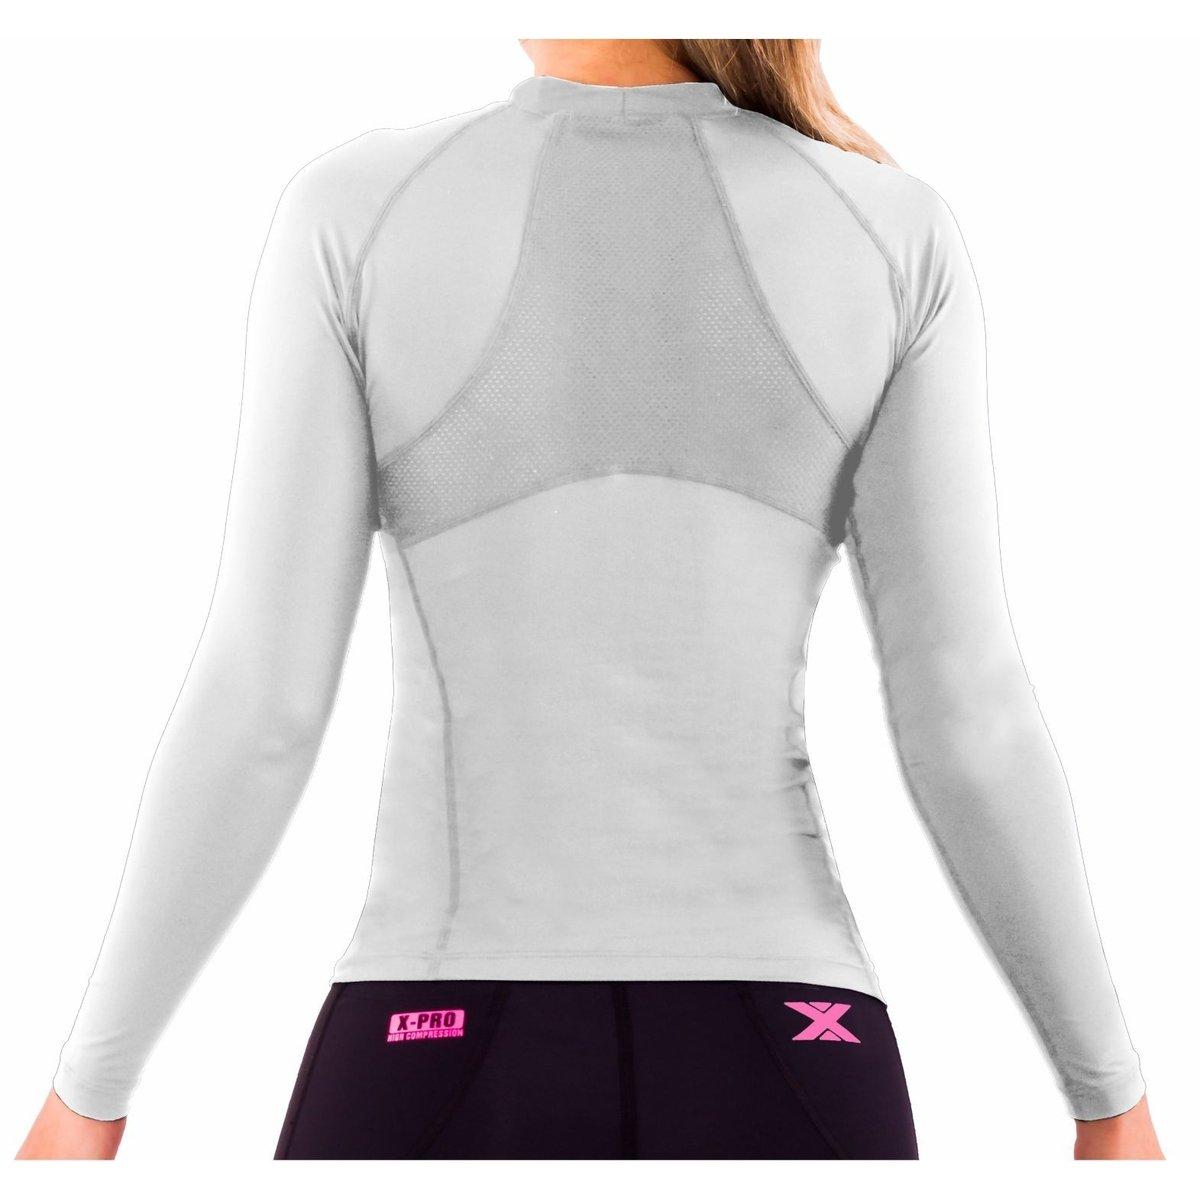 Camisa DX3 XSOFT Feminina Manga Longa Corrida Fitness Trekking 91028 ... fa212a0bffc1a